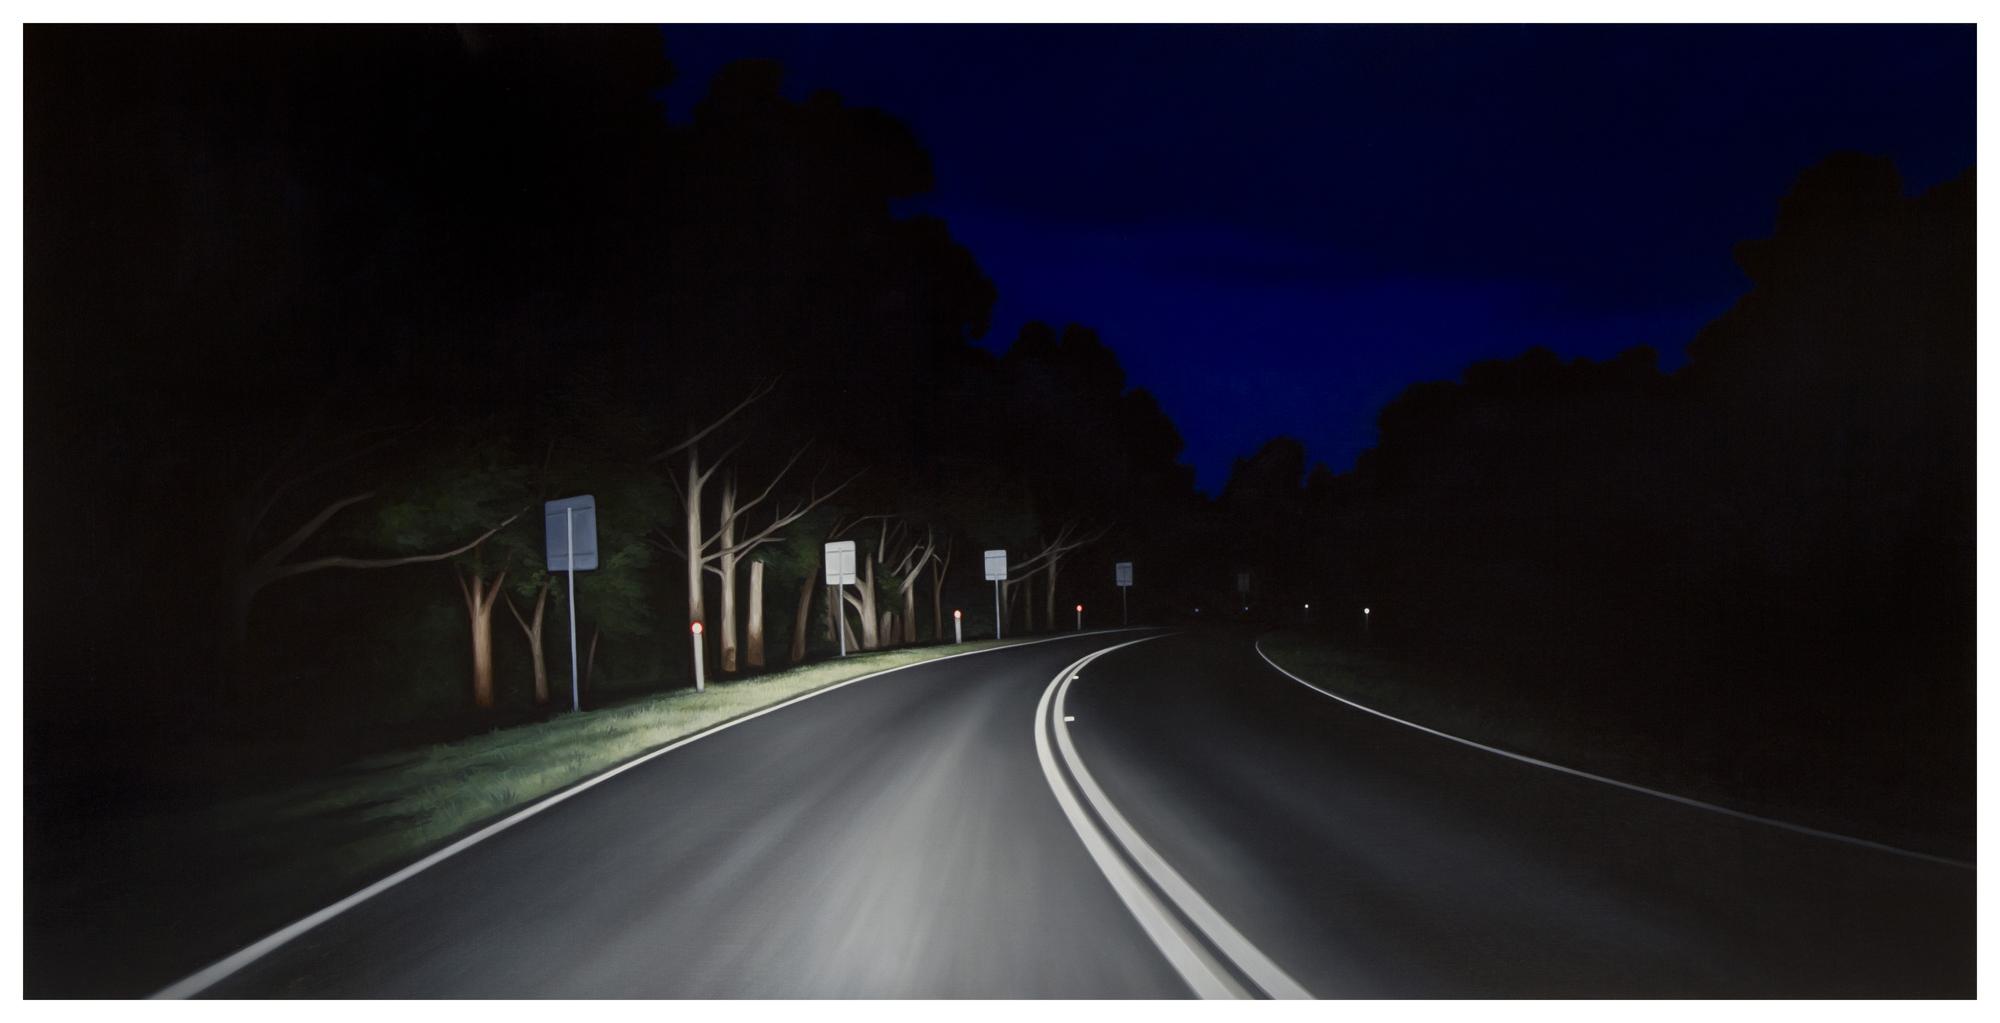 TONY LLOYD  The Other Way  2014 oil on linen 120 ×240 cm